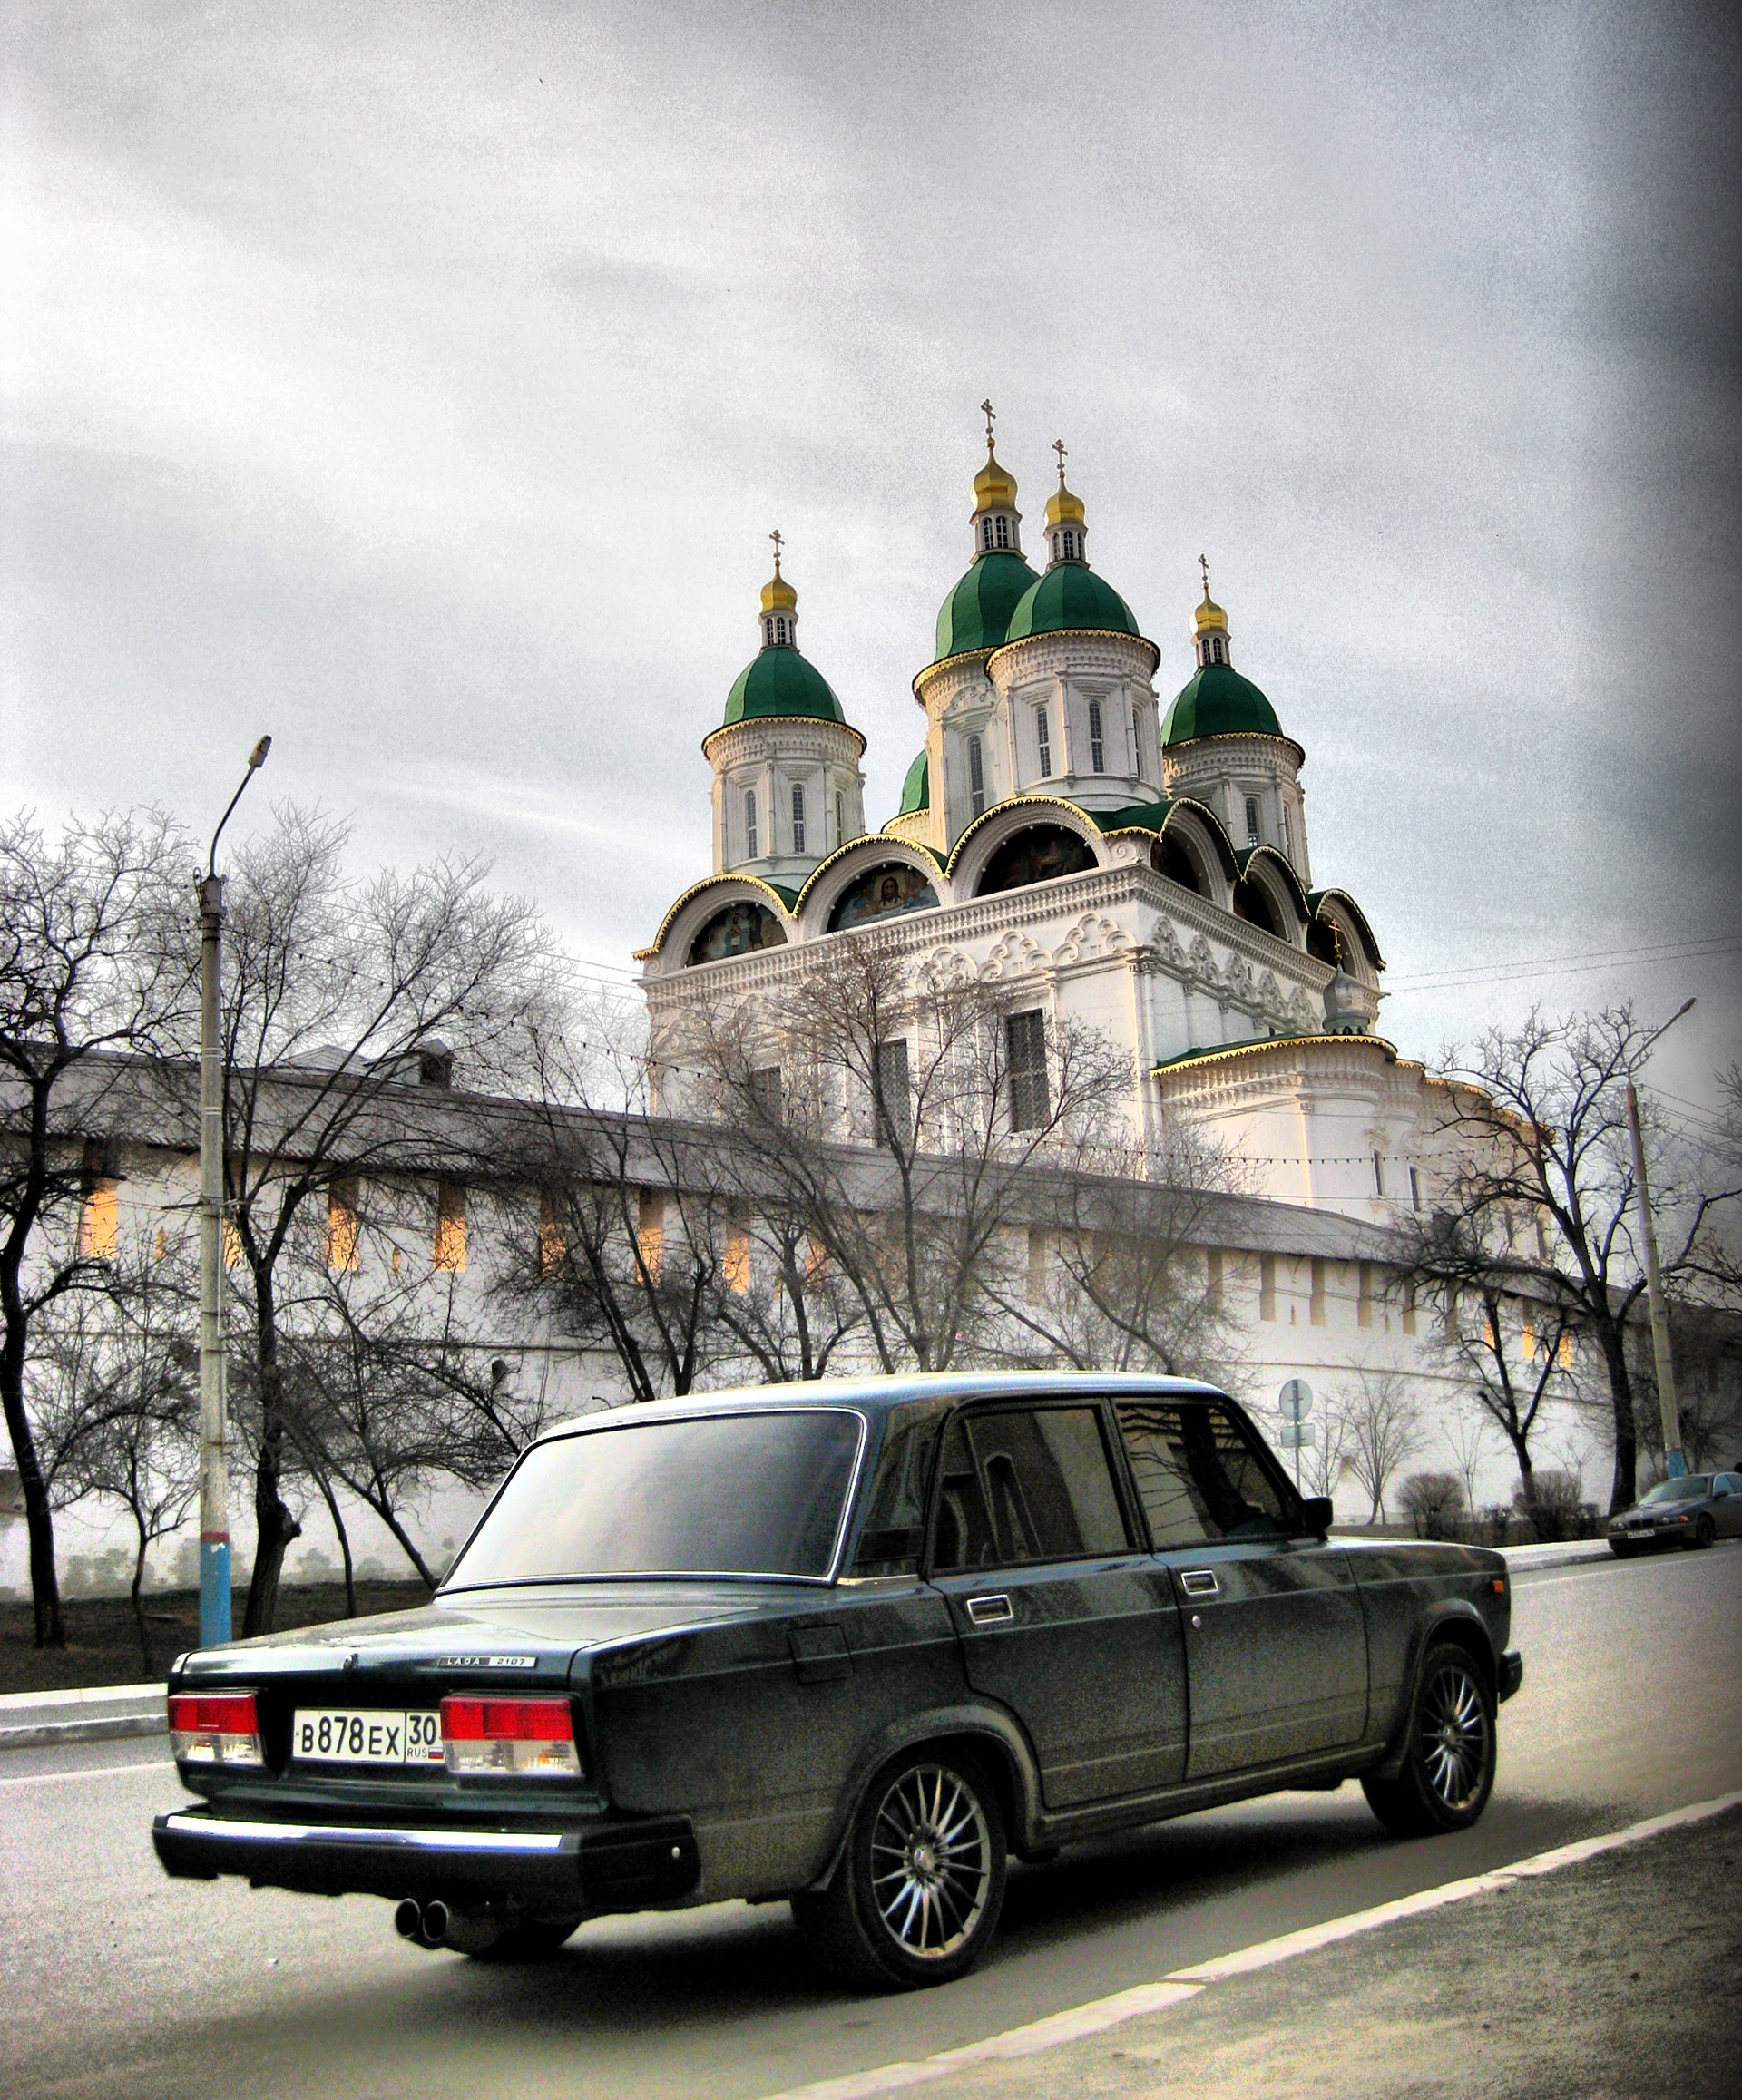 Лада 2107 [Astrakhan night wolf]